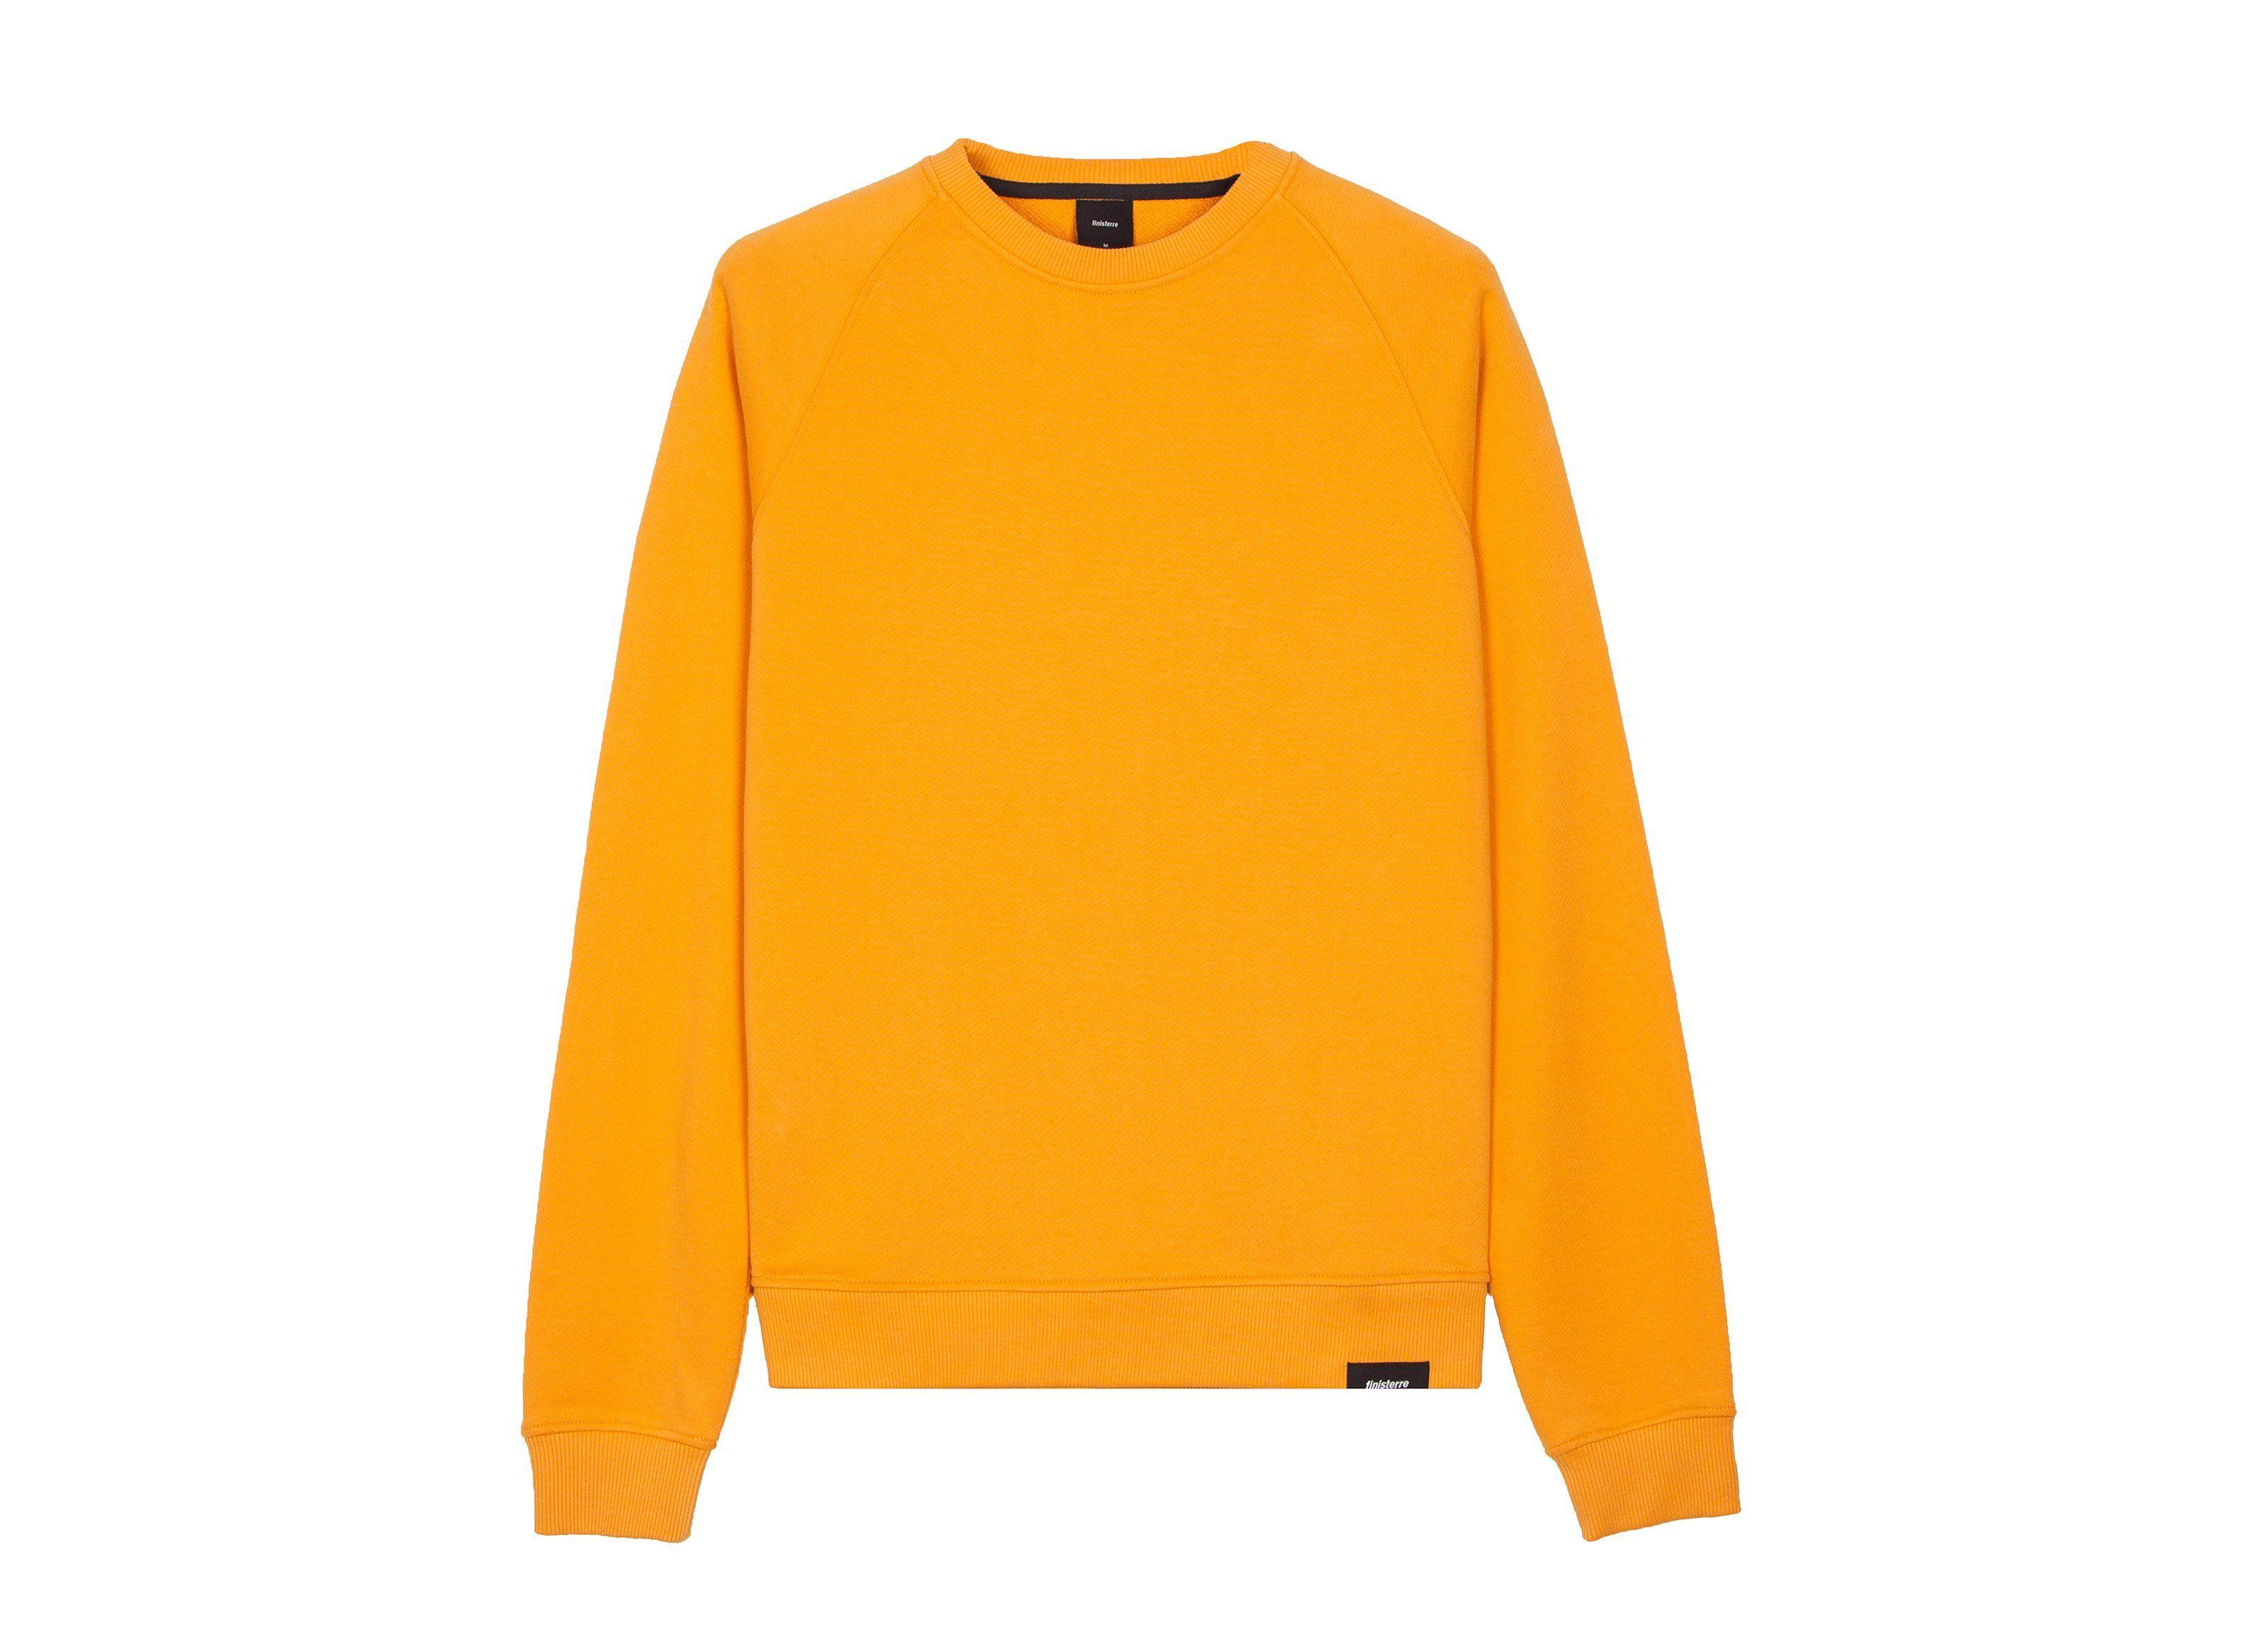 32bbf2531bd Men's Coho Ochre Yellow 100% Organic Cotton Sweatshirt | Finisterre ...